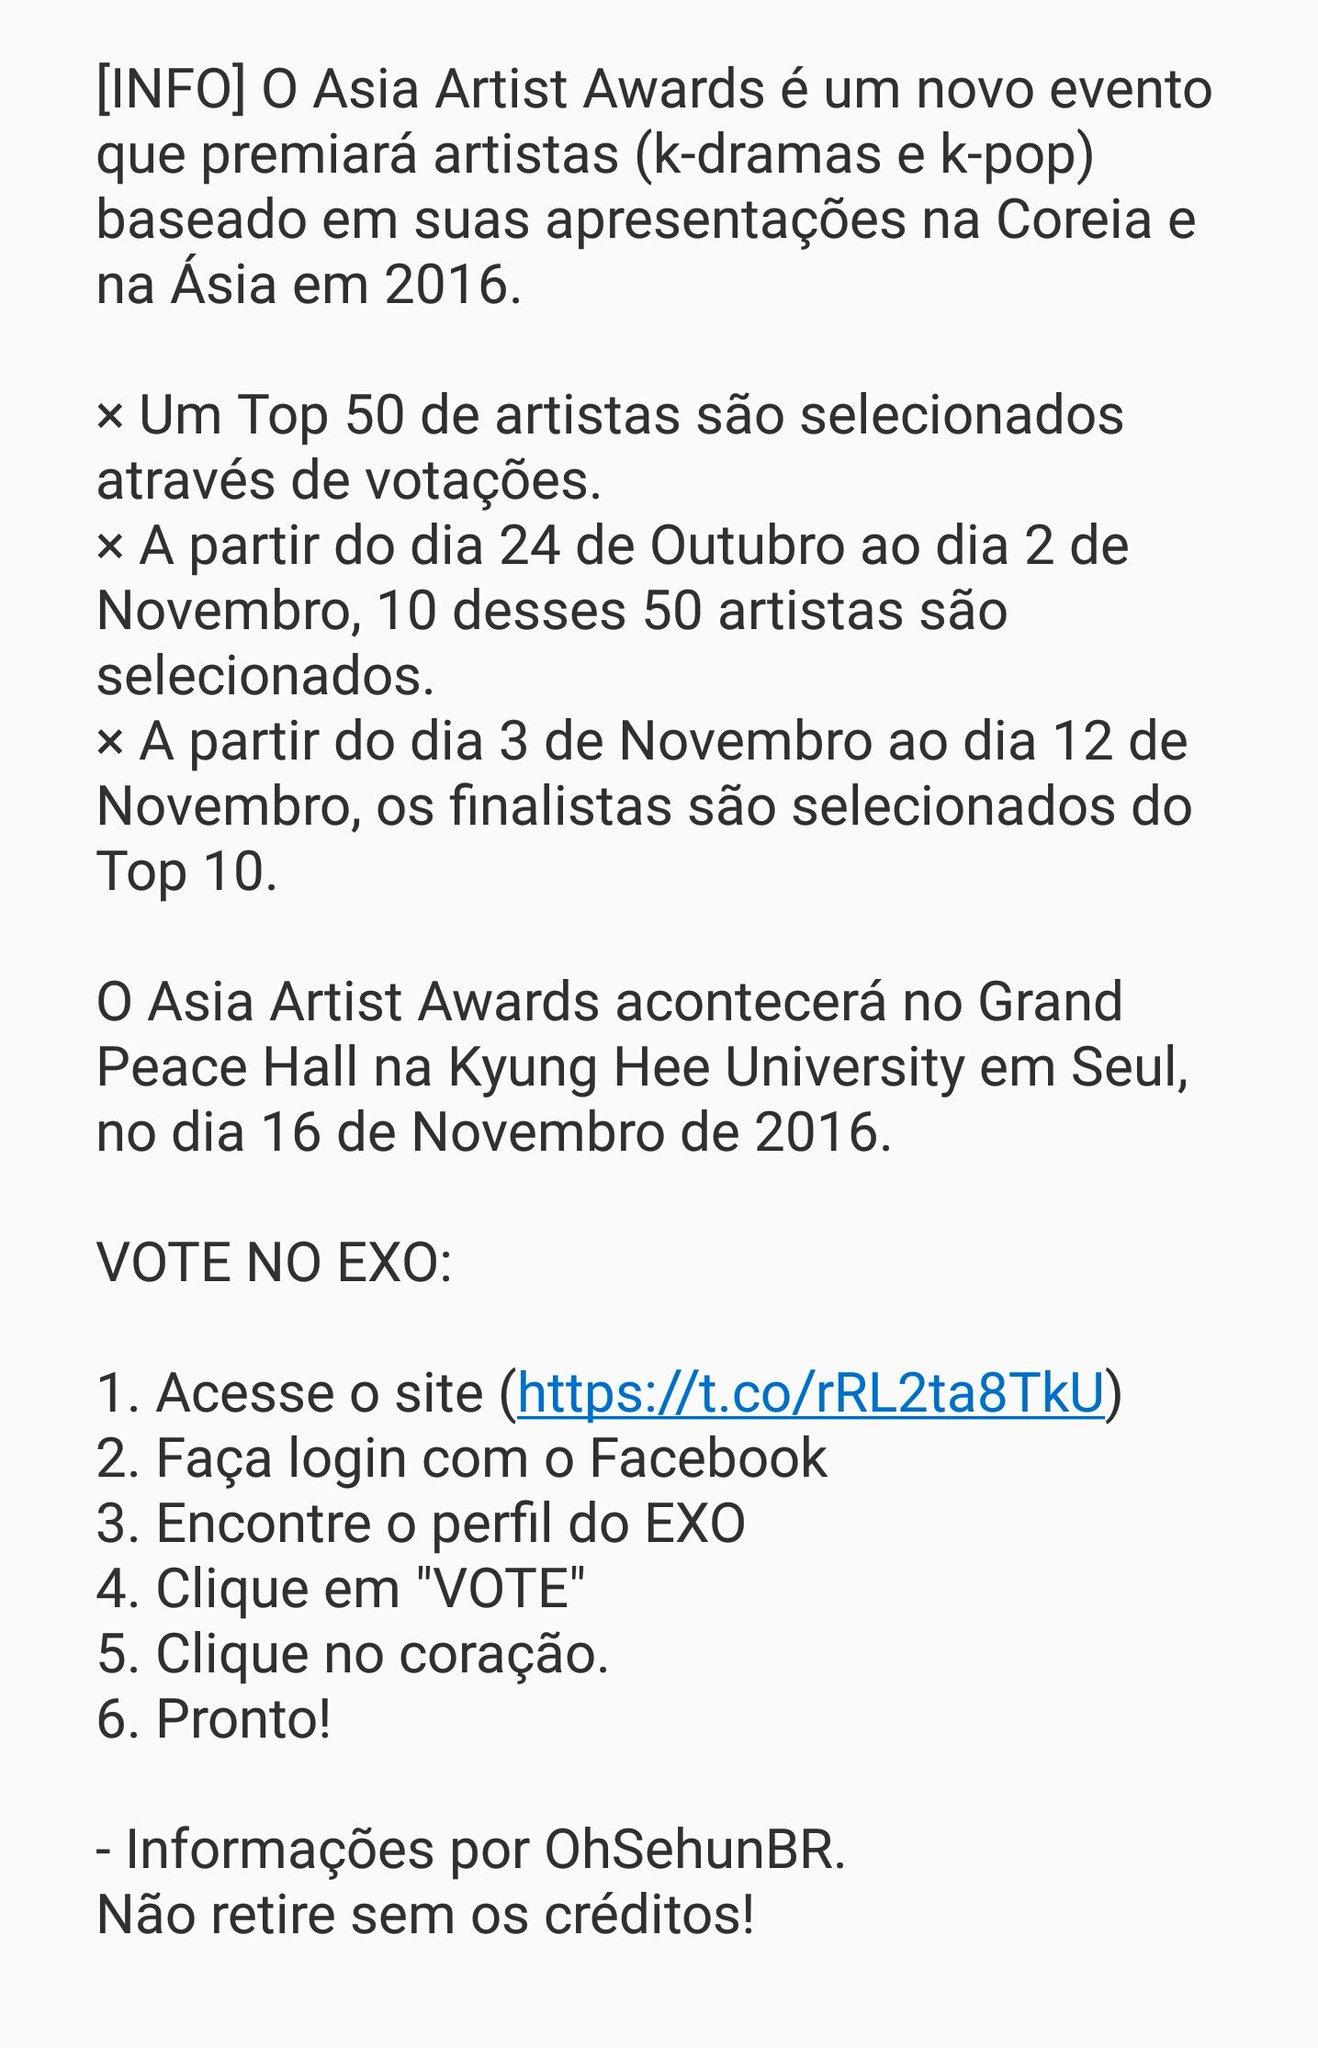 [#INFO] Vote no EXO para o Asia Artist Awards.  × https://t.co/87d5O7rjLQ https://t.co/rMDztwePlM